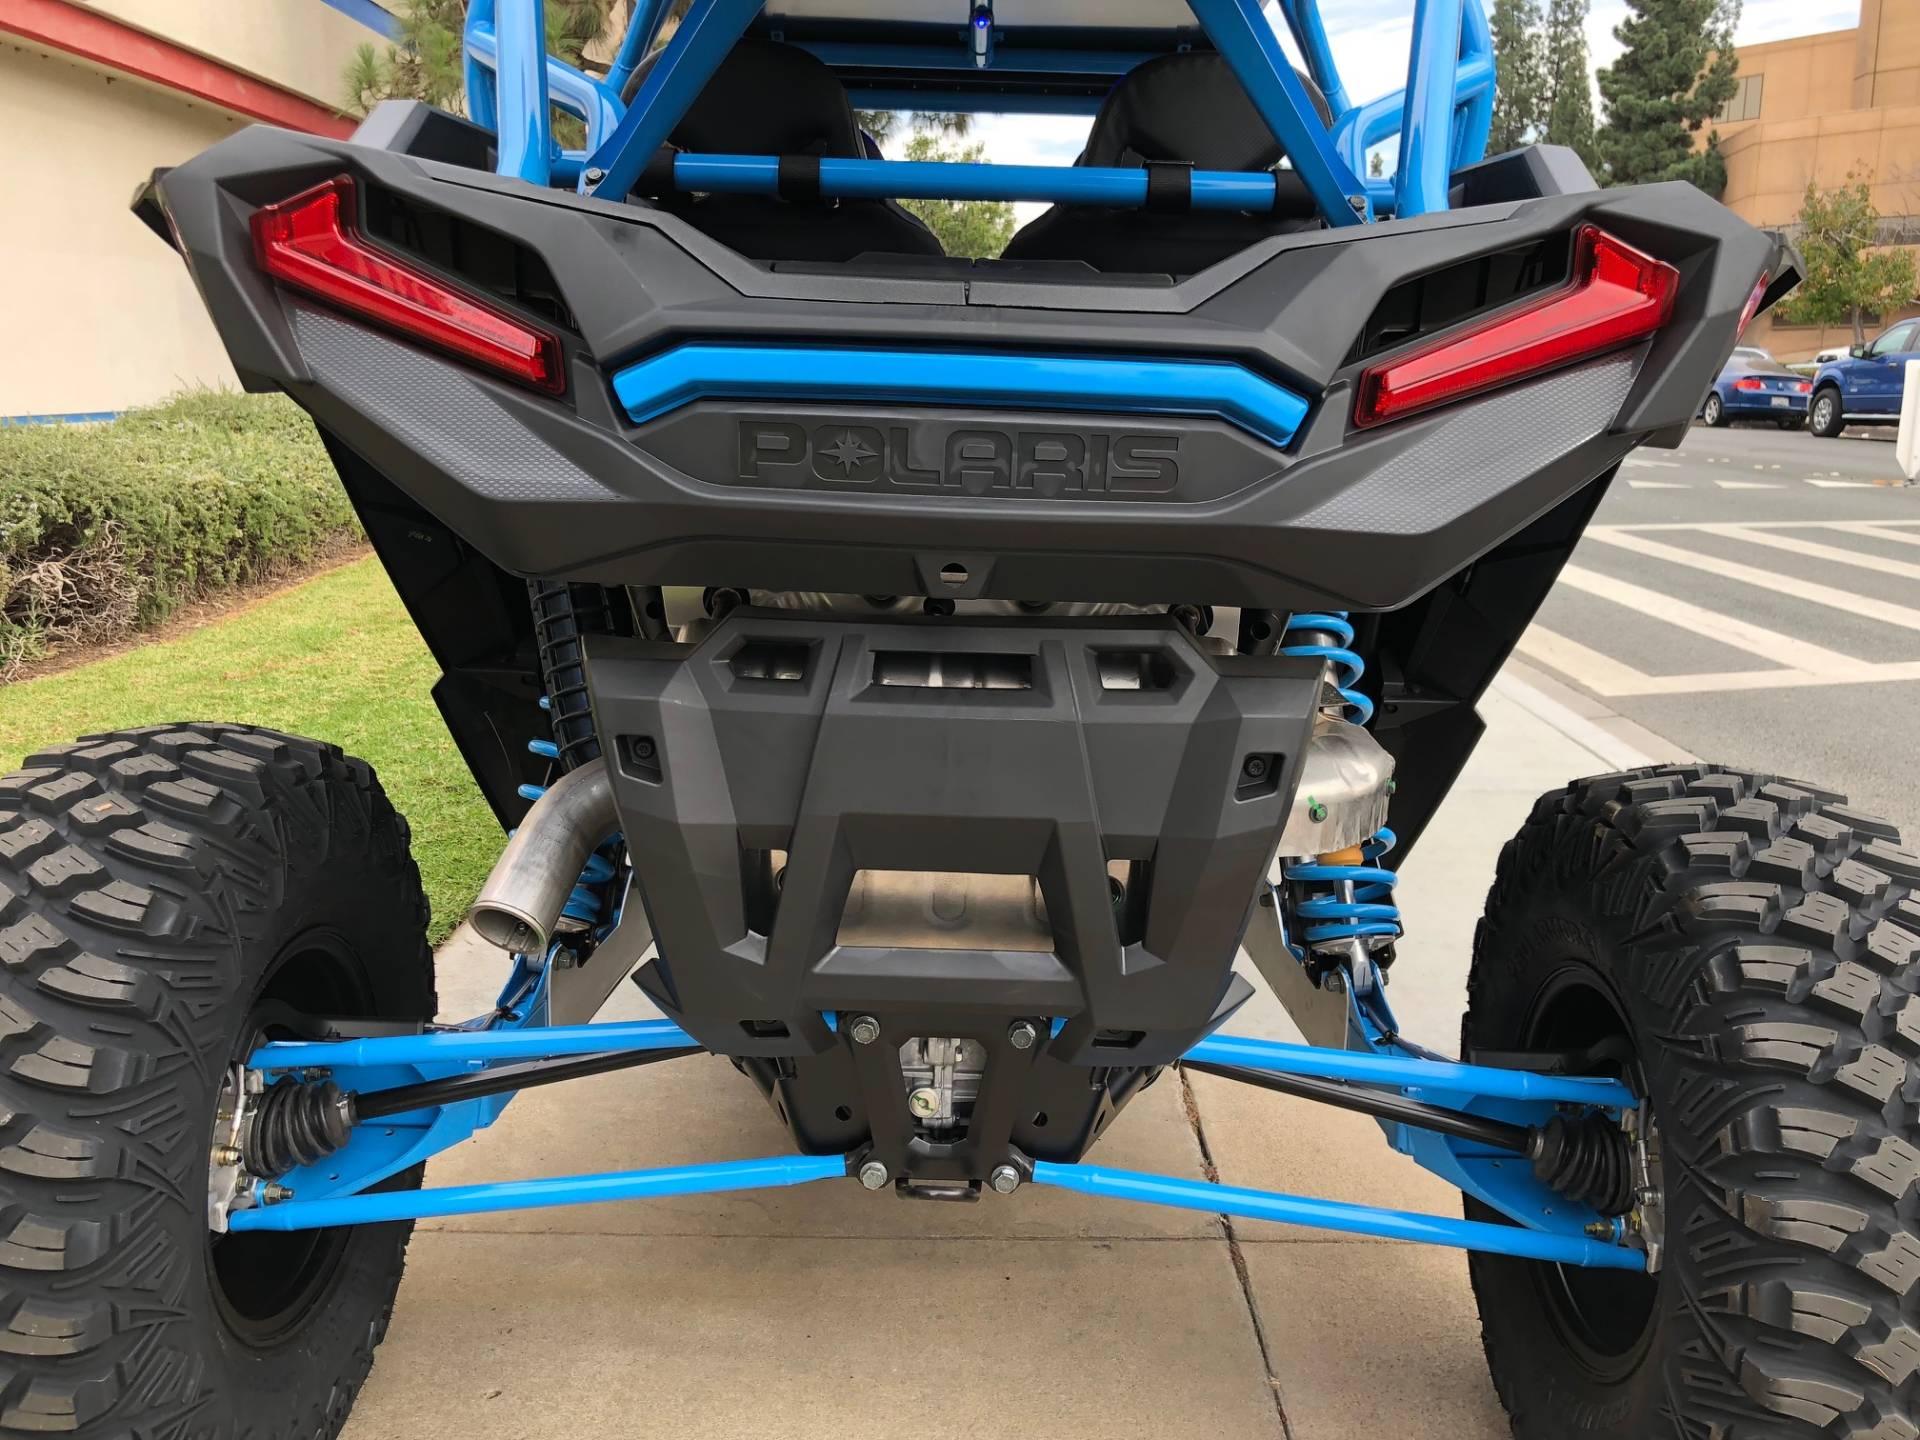 New 2019 Polaris RZR XP 4 Turbo | Utility Vehicles in EL Cajon CA